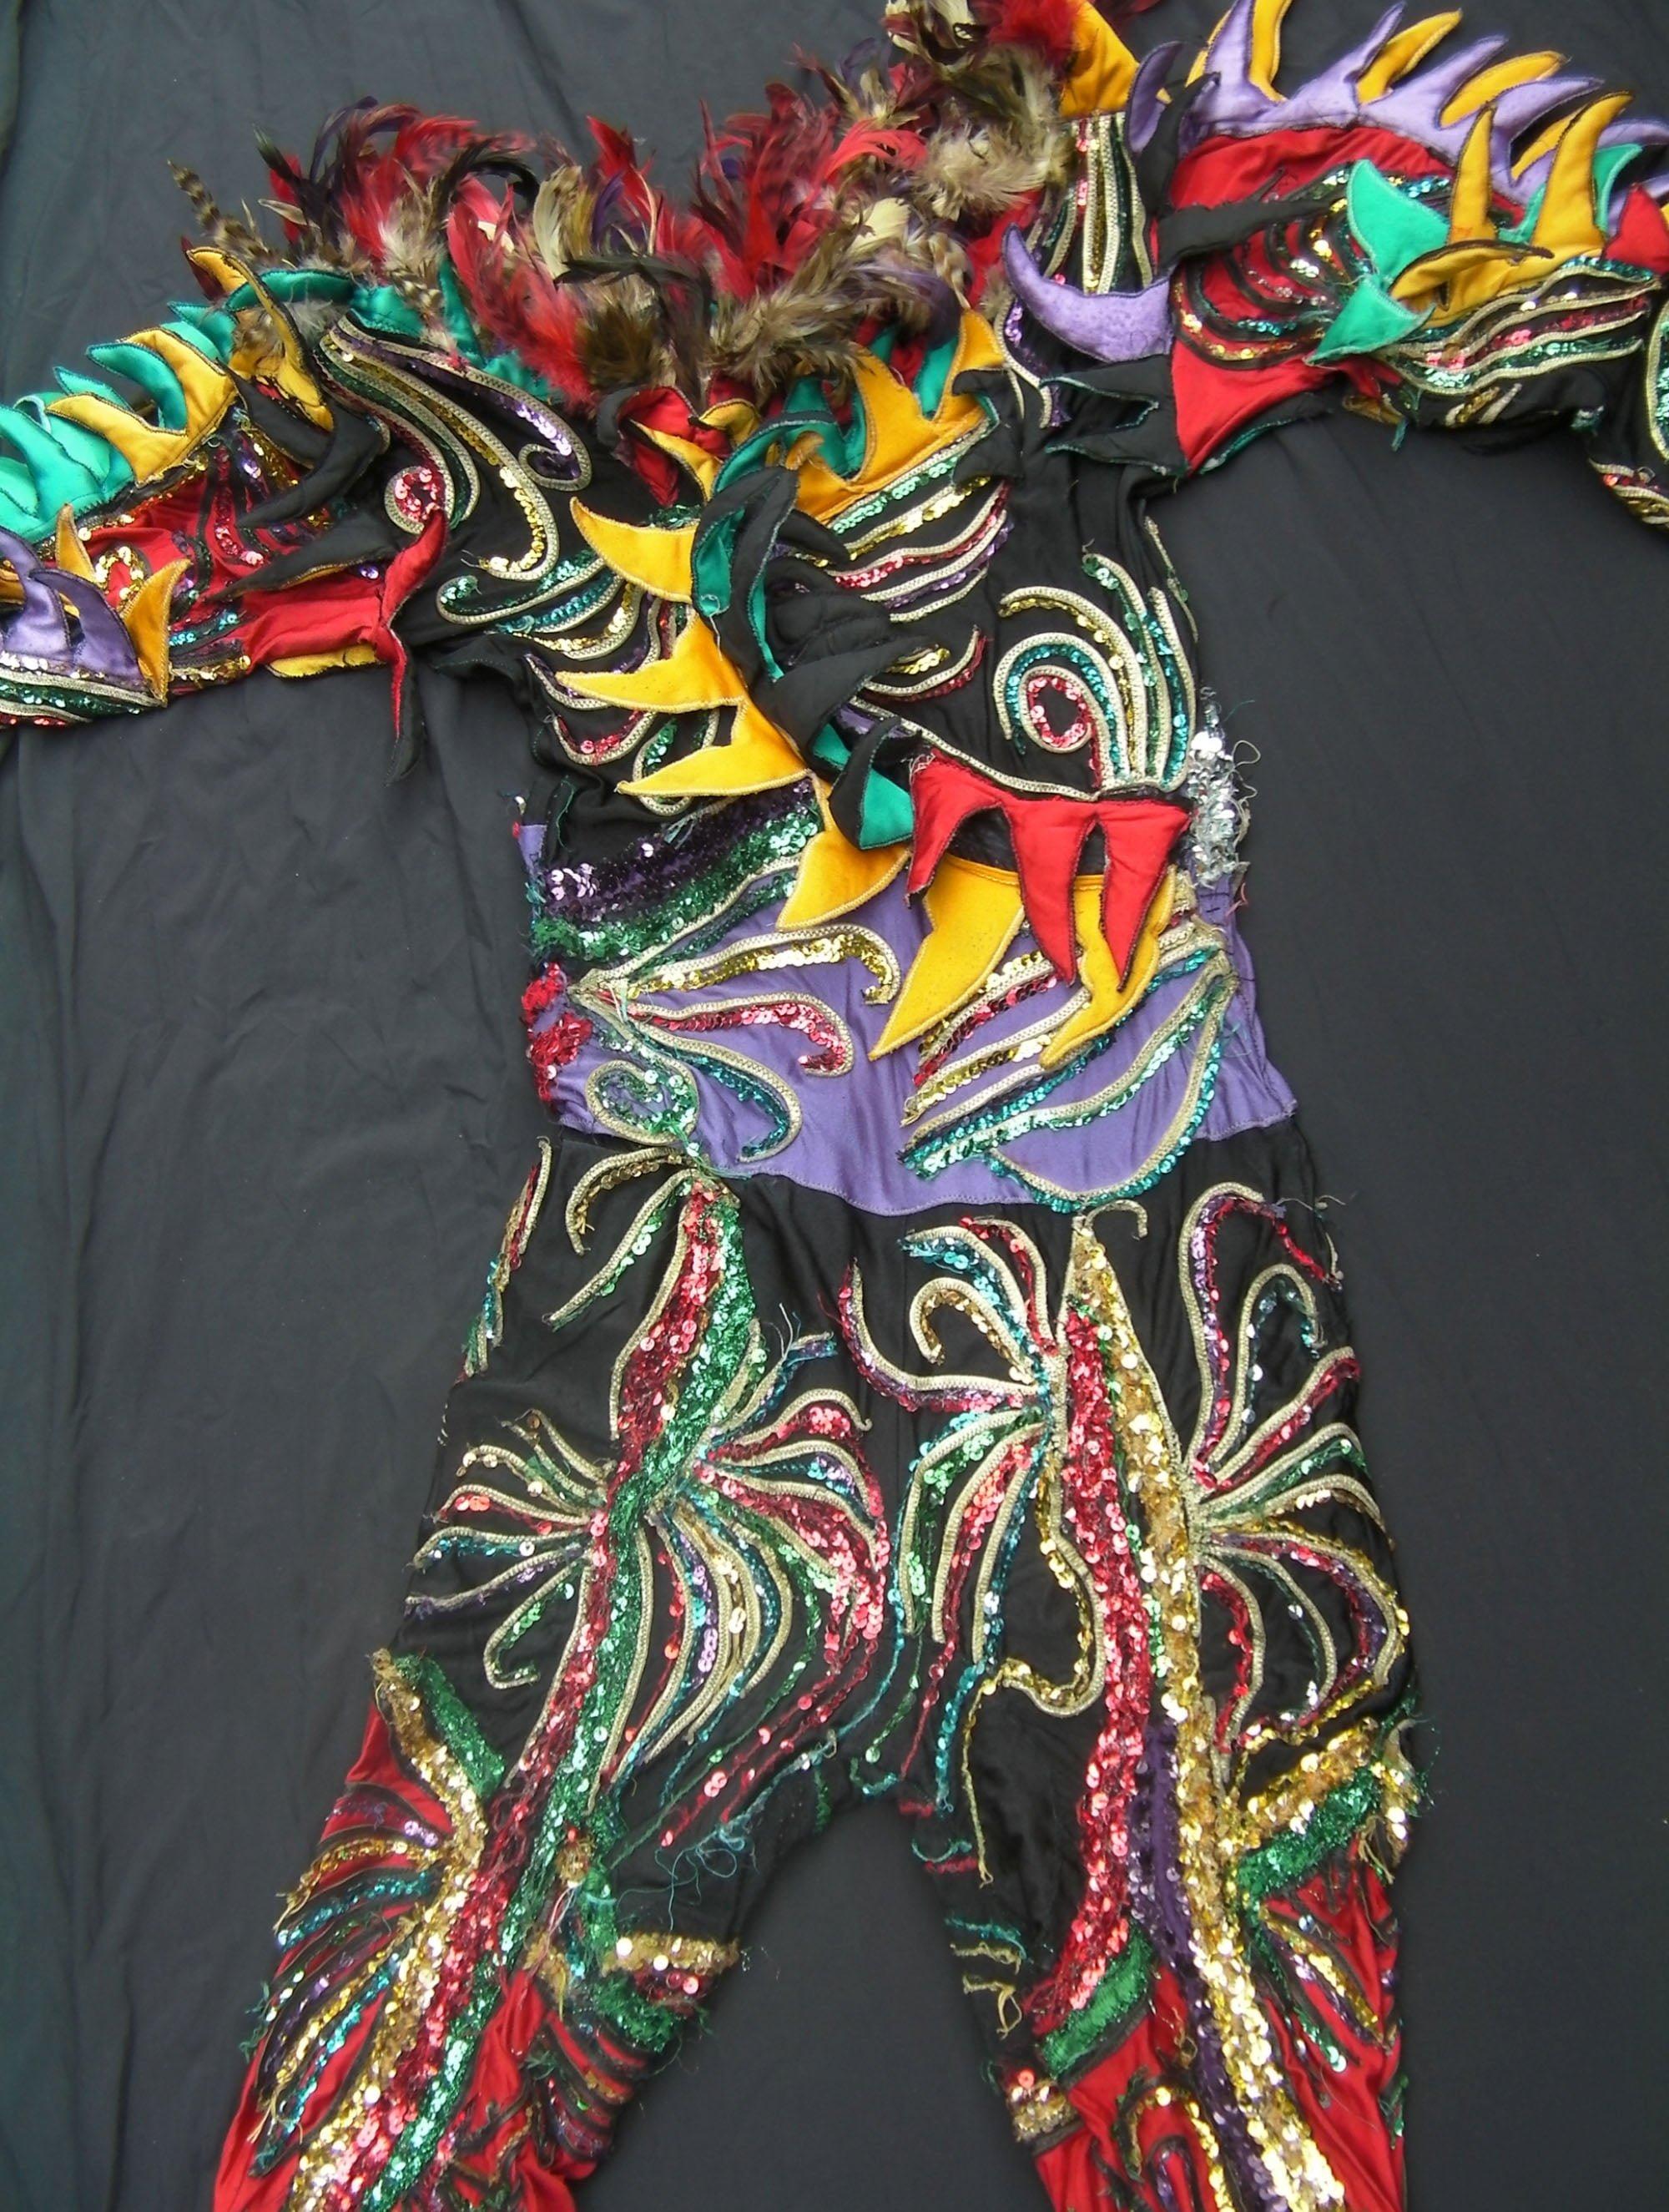 The Firebird costume